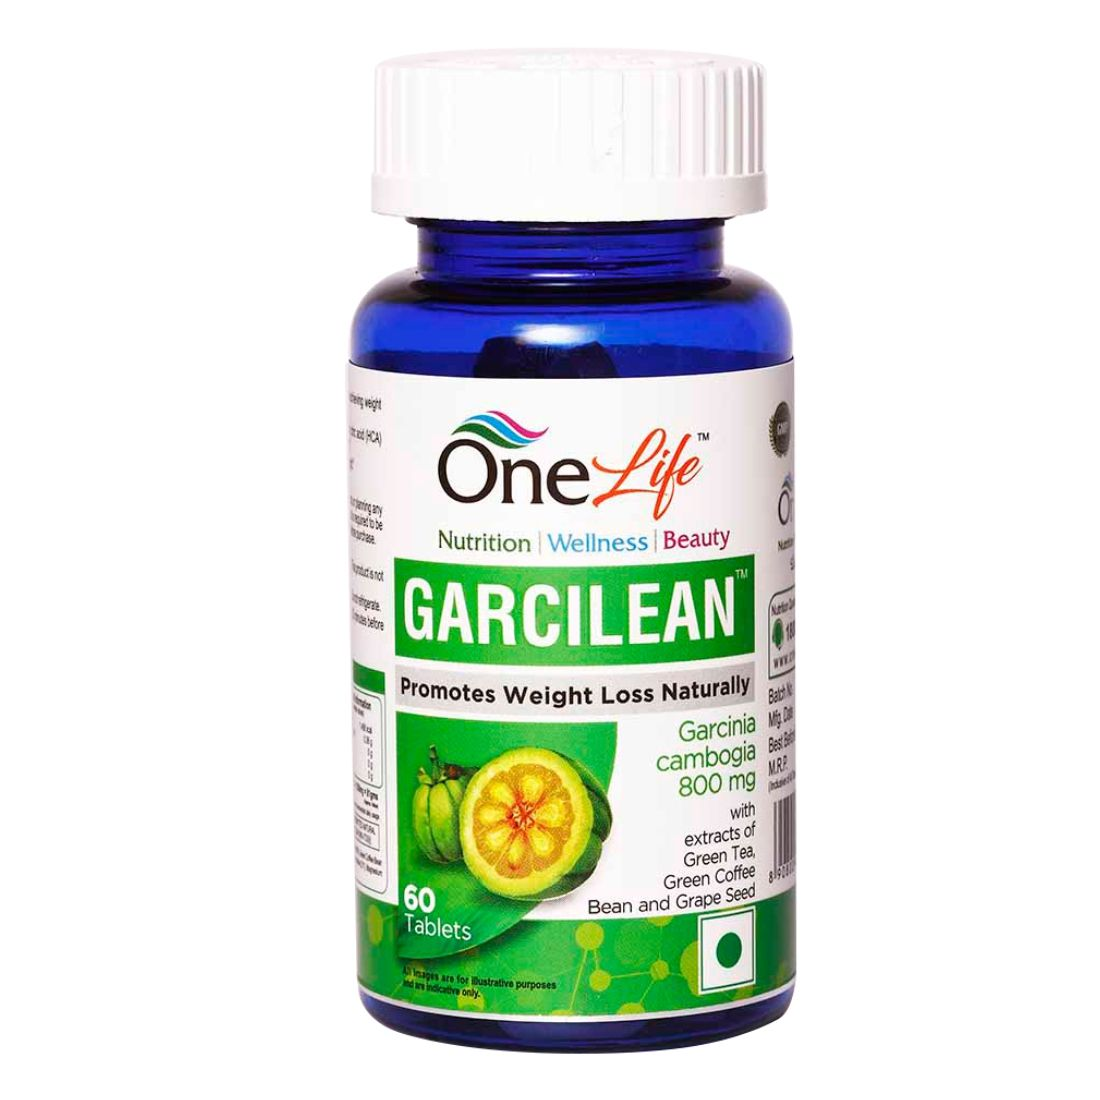 Onelife Garcilean Weight Loss (Green Tea Extract) 60 Tablets